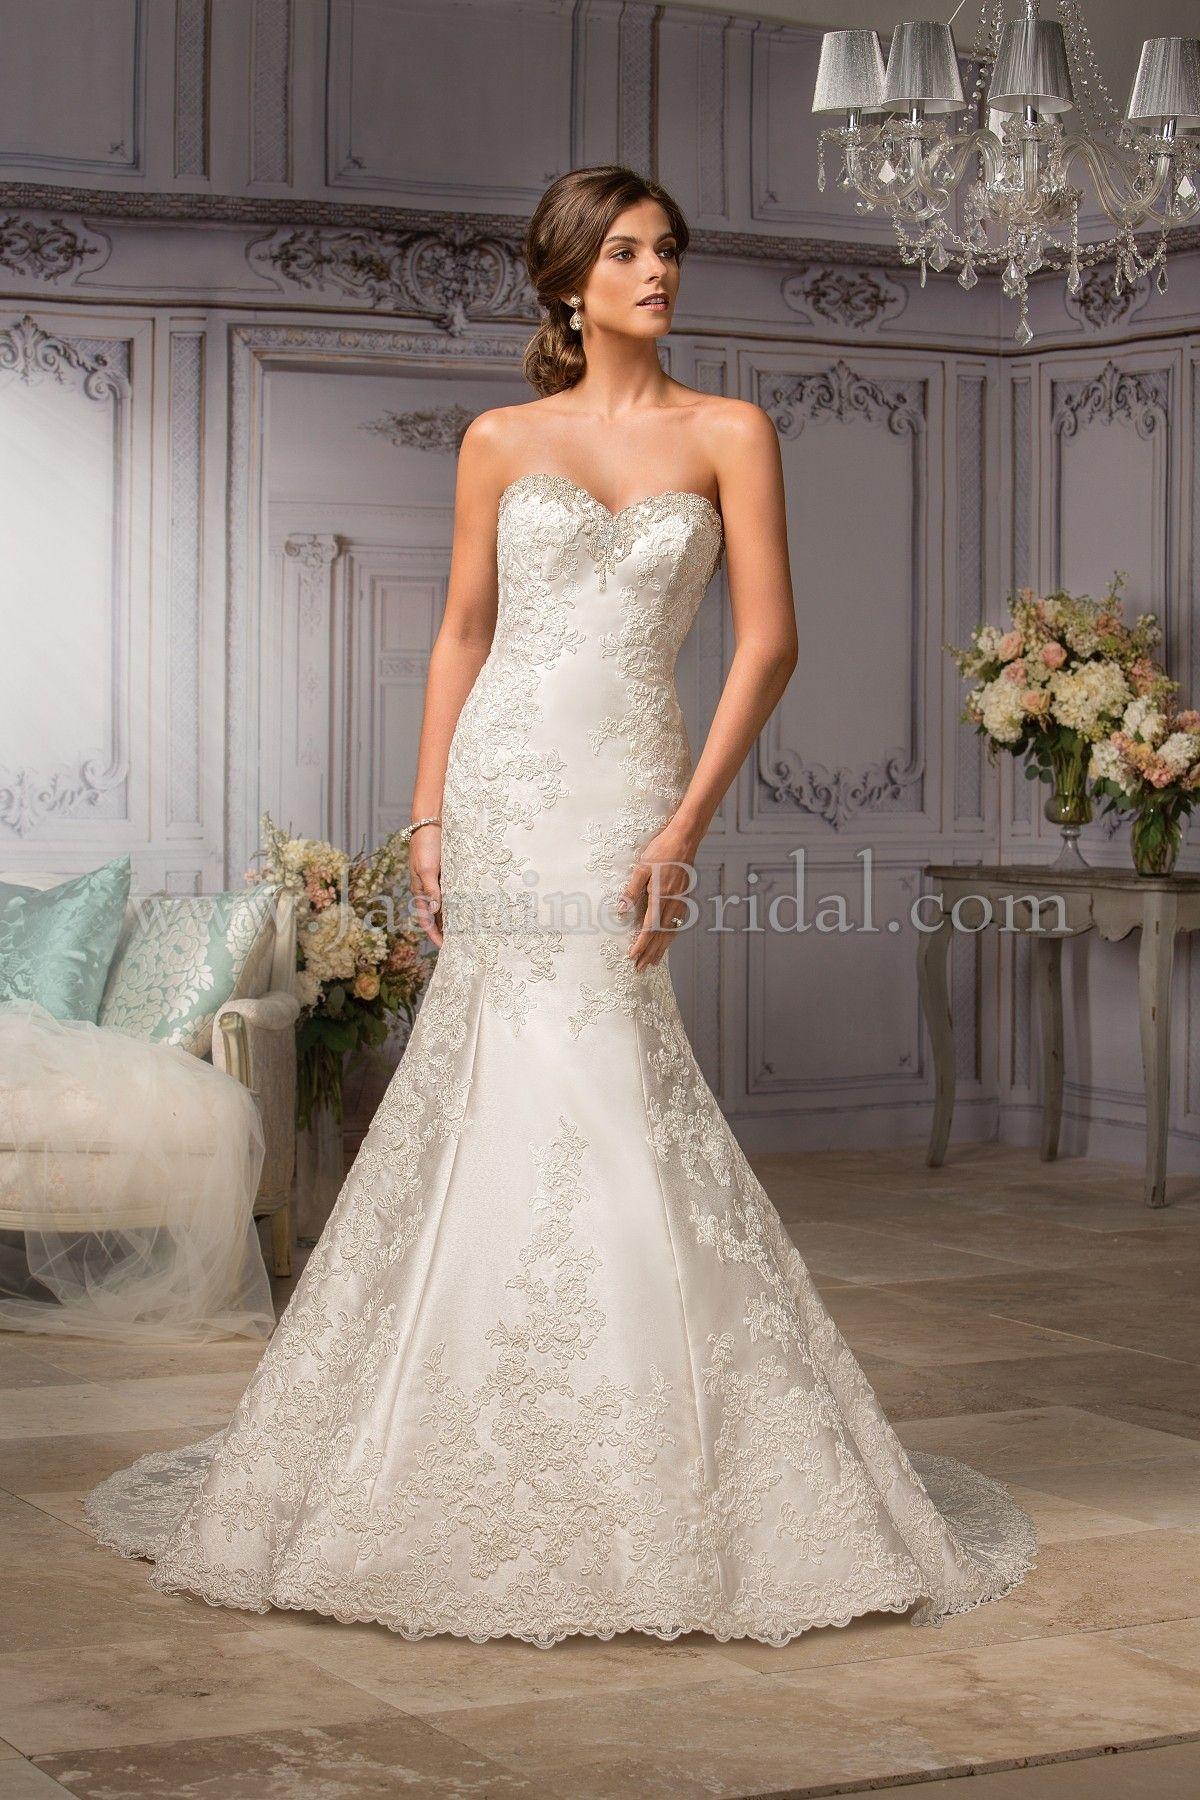 Jasmine bridal couture style t in ivory jasmine bridal